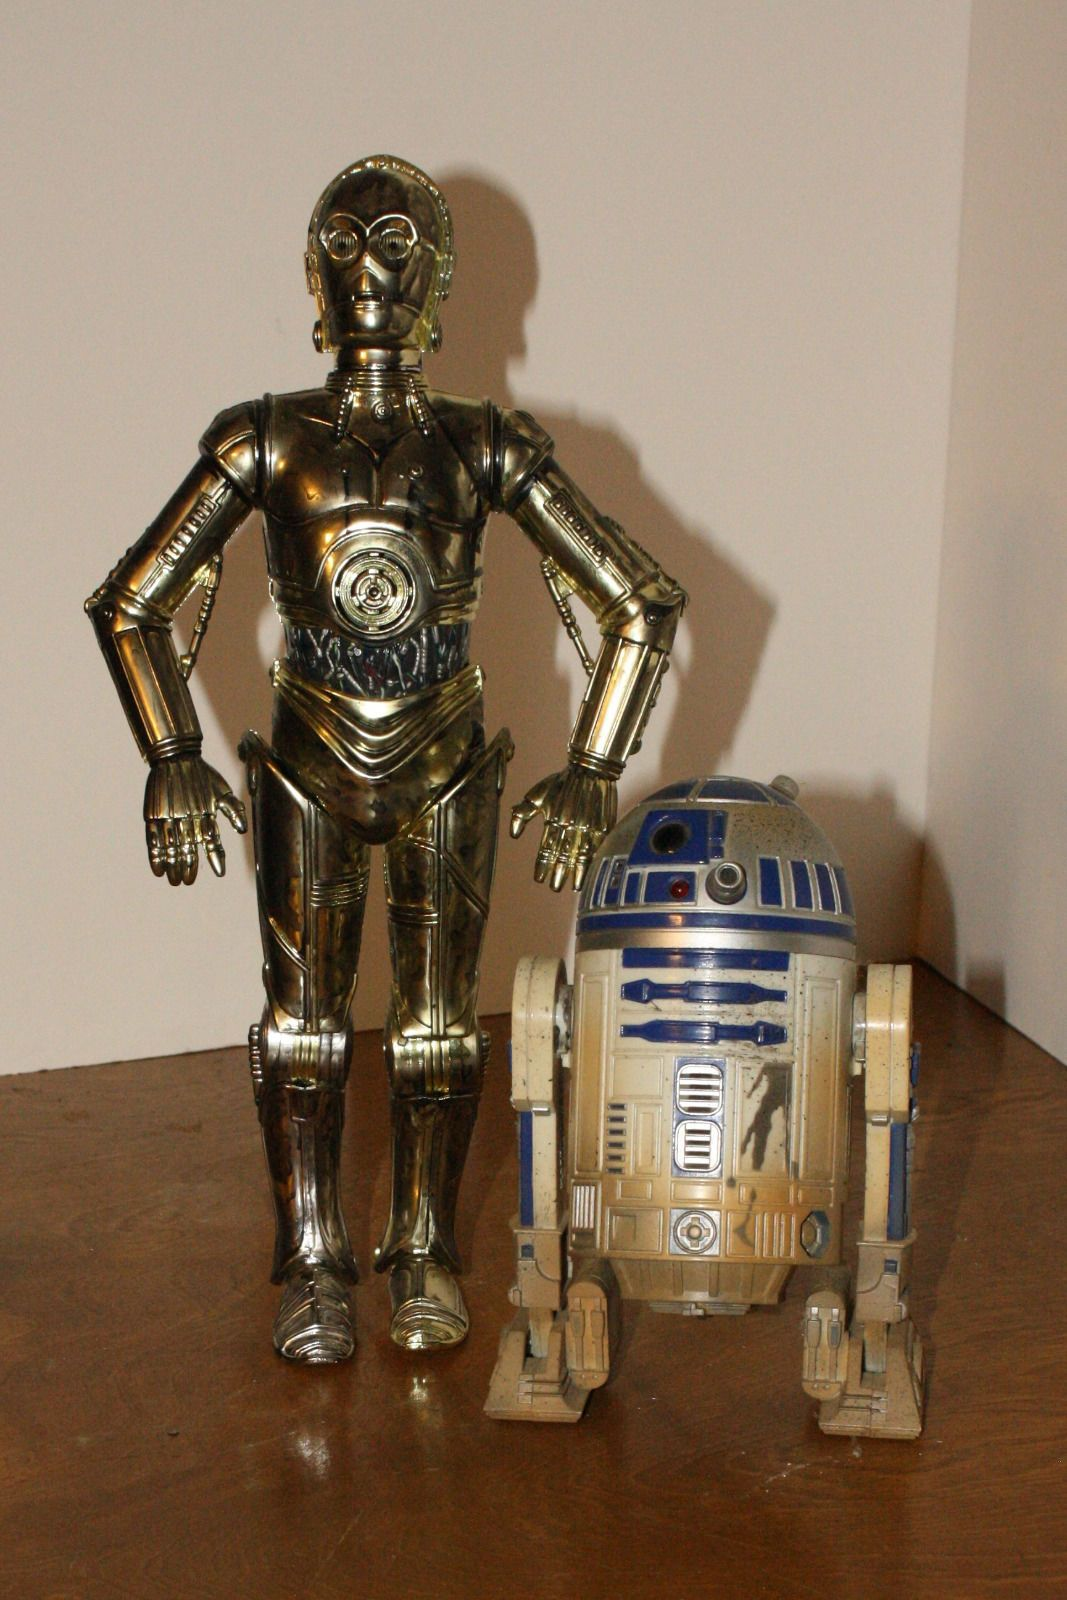 Star Wars R2-D2 Collectible Figurine le dernier Jedi par Hasbro Disney